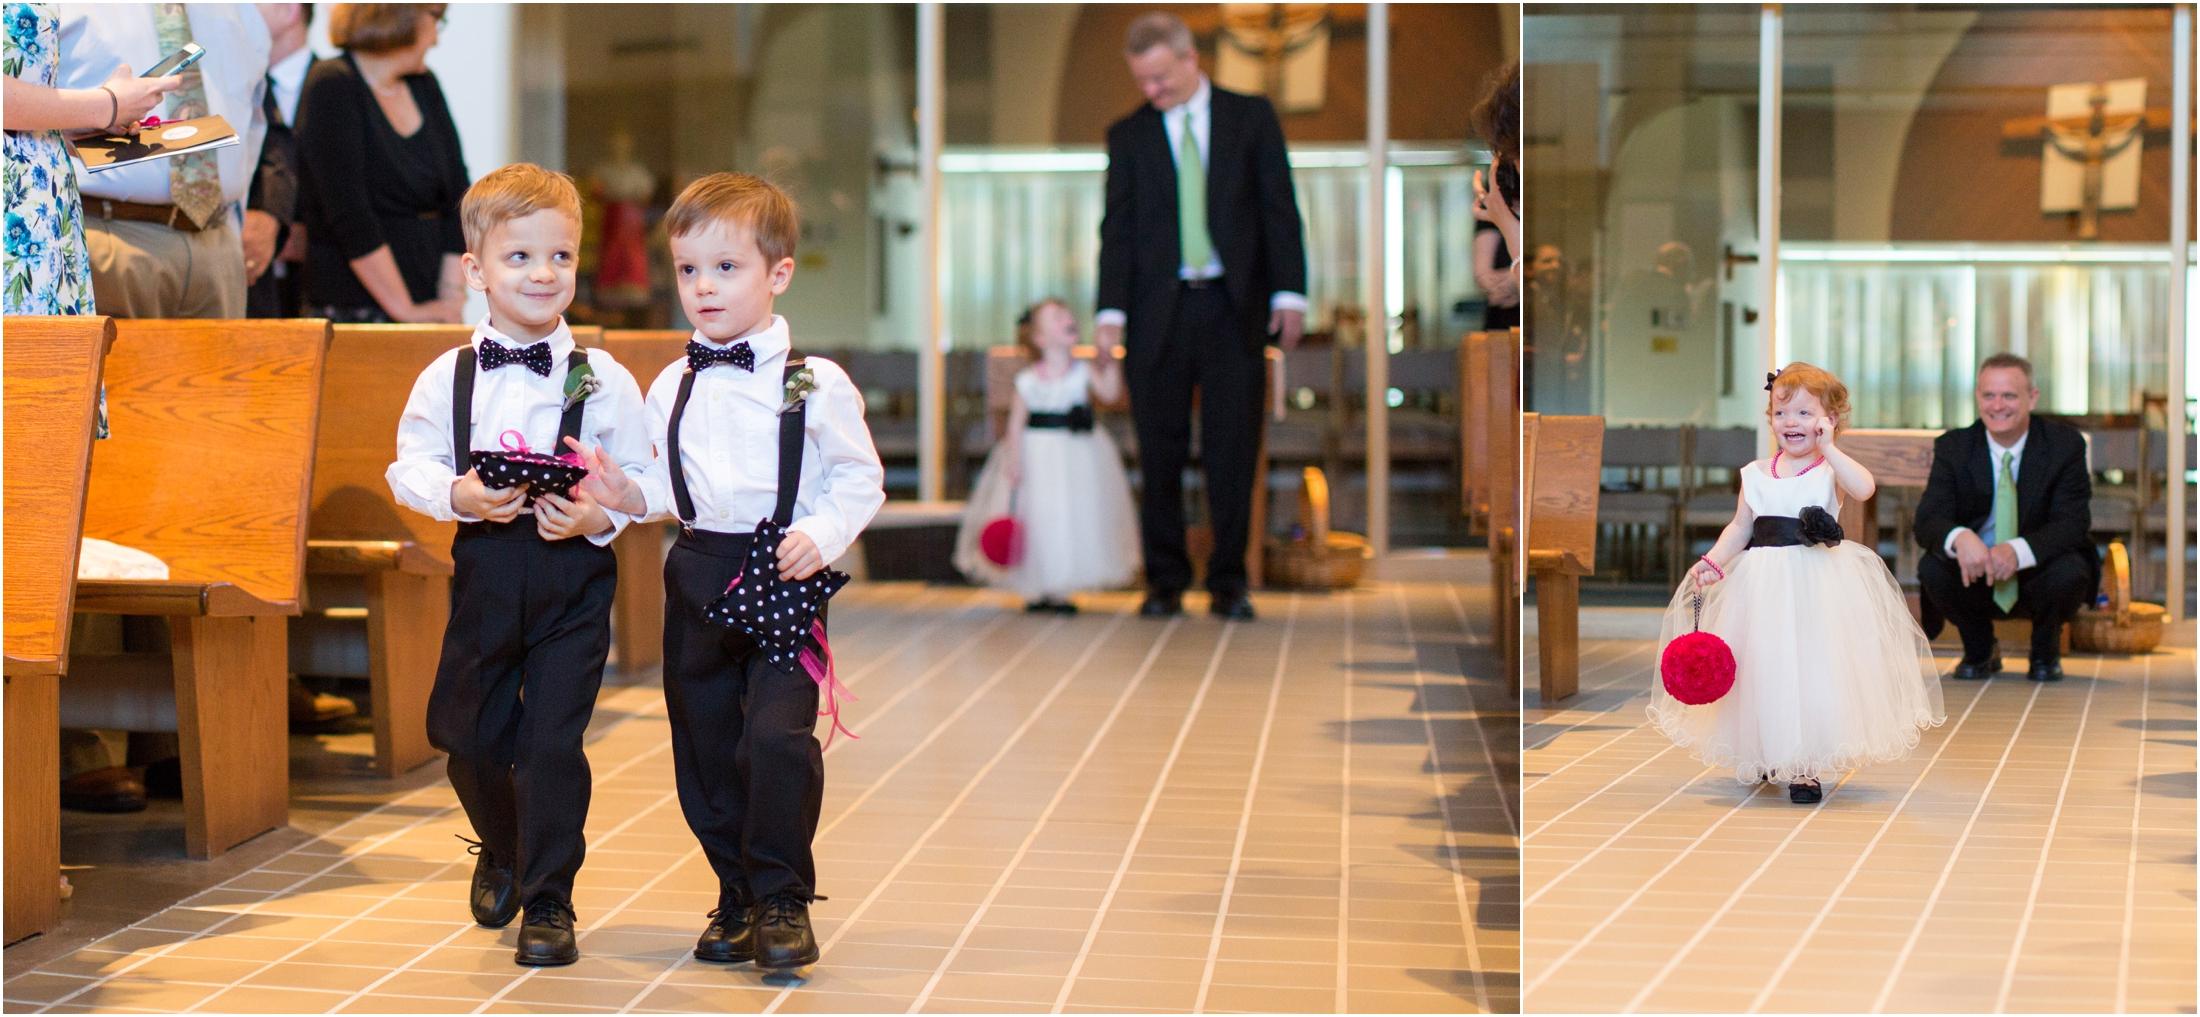 4-Lambert-Wedding-Ceremony-845.jpg